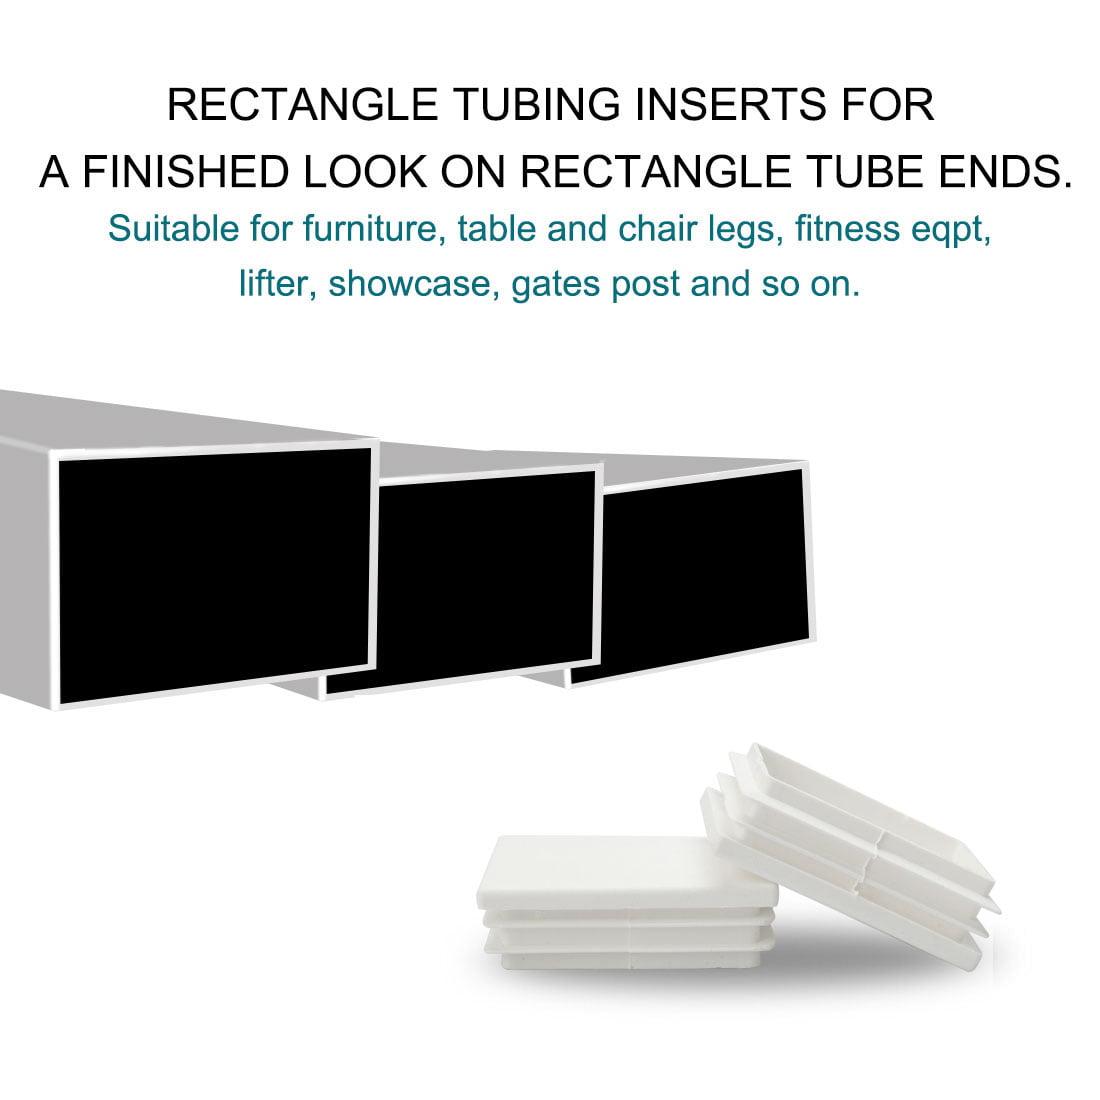 12pcs 40 x 60mm Plastic Rectangle Ribbed Tube Inserts End Cover Cap Table Feet - image 5 de 7